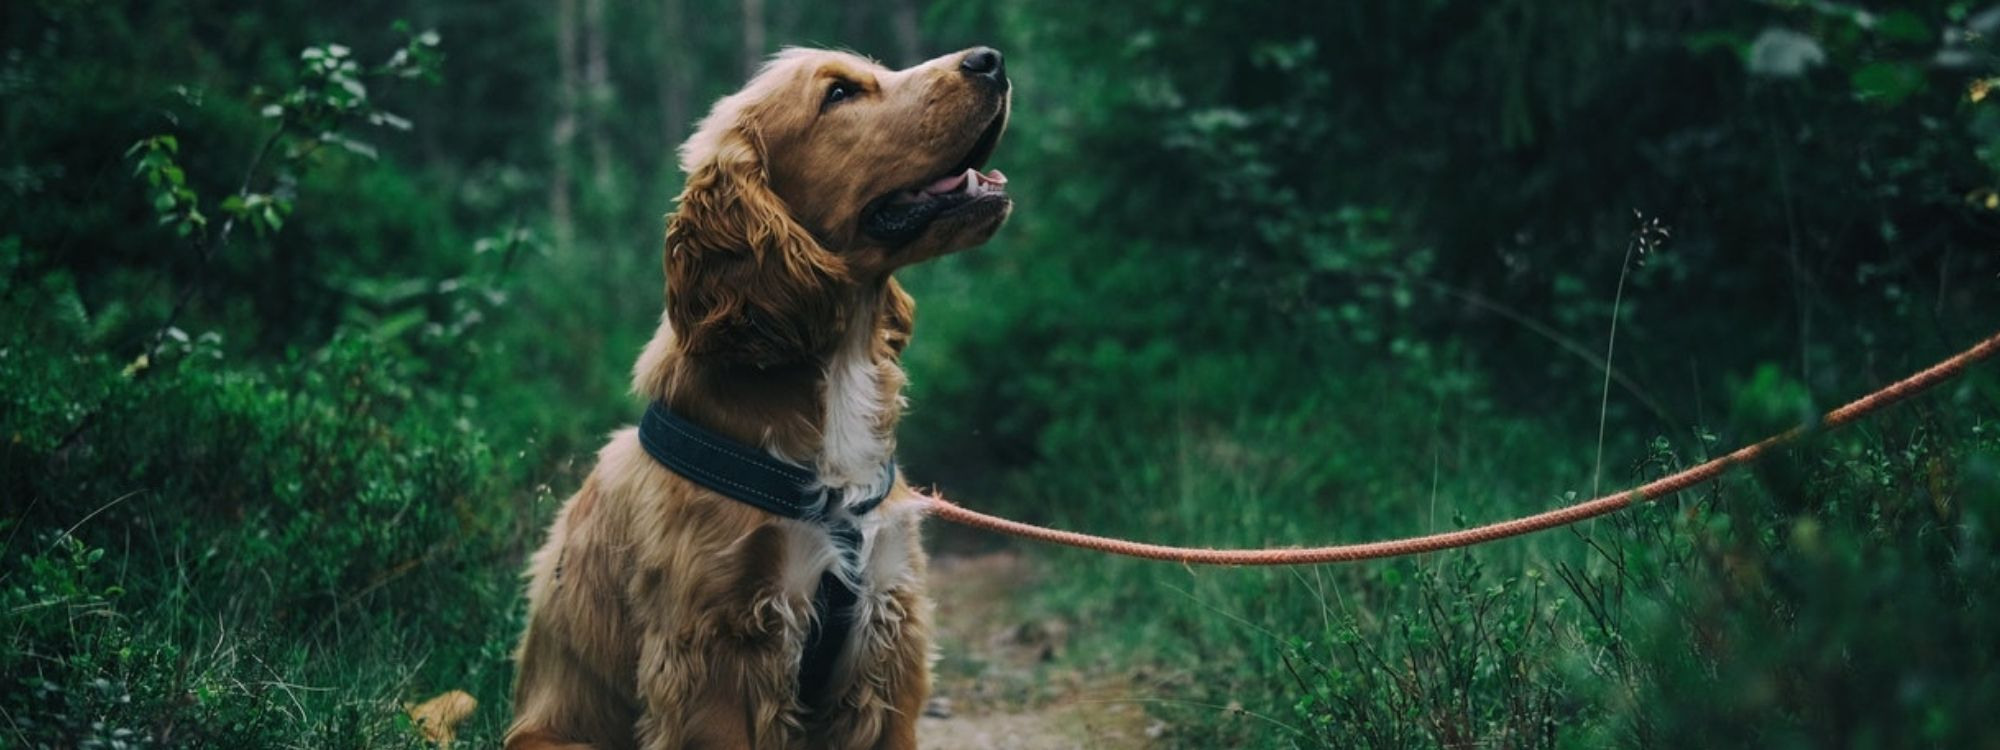 Parasite Prevention & Treatment | Wellington Veterinary Hospital